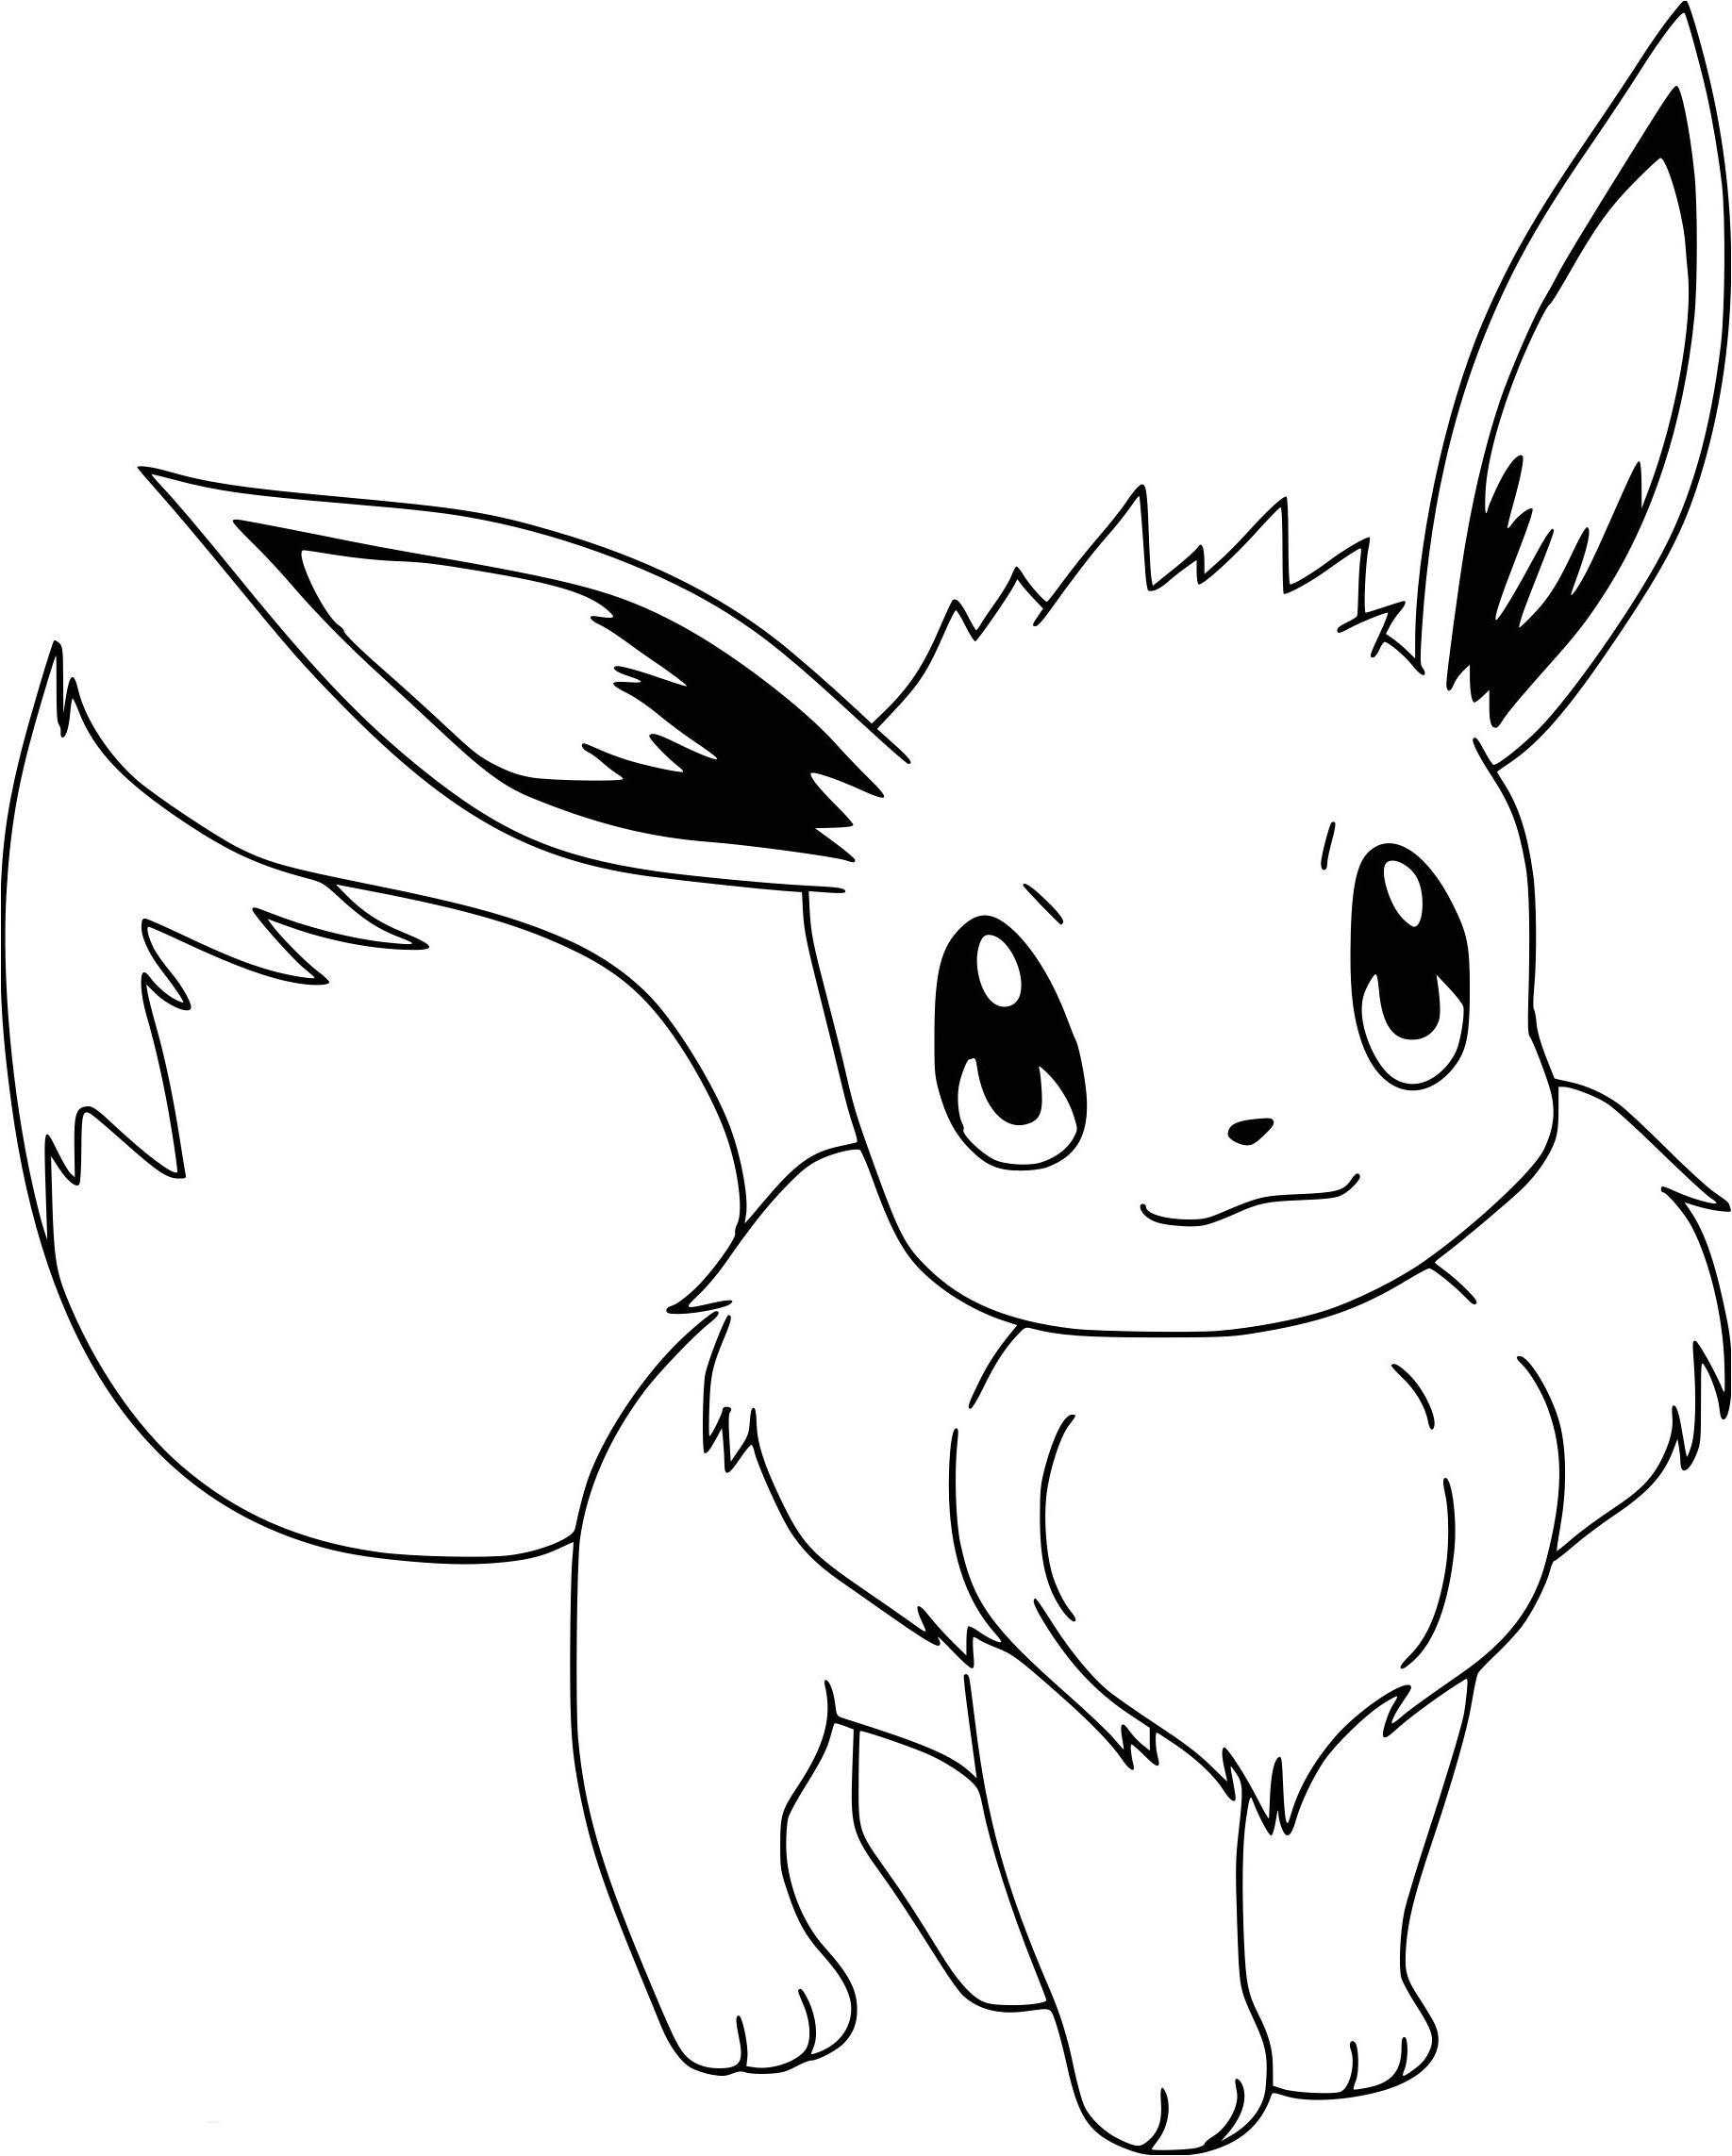 Dessin Pokemon Solgaleo Bestof Photos Coloriage Pokemon tout Photo De Pokémon À Imprimer